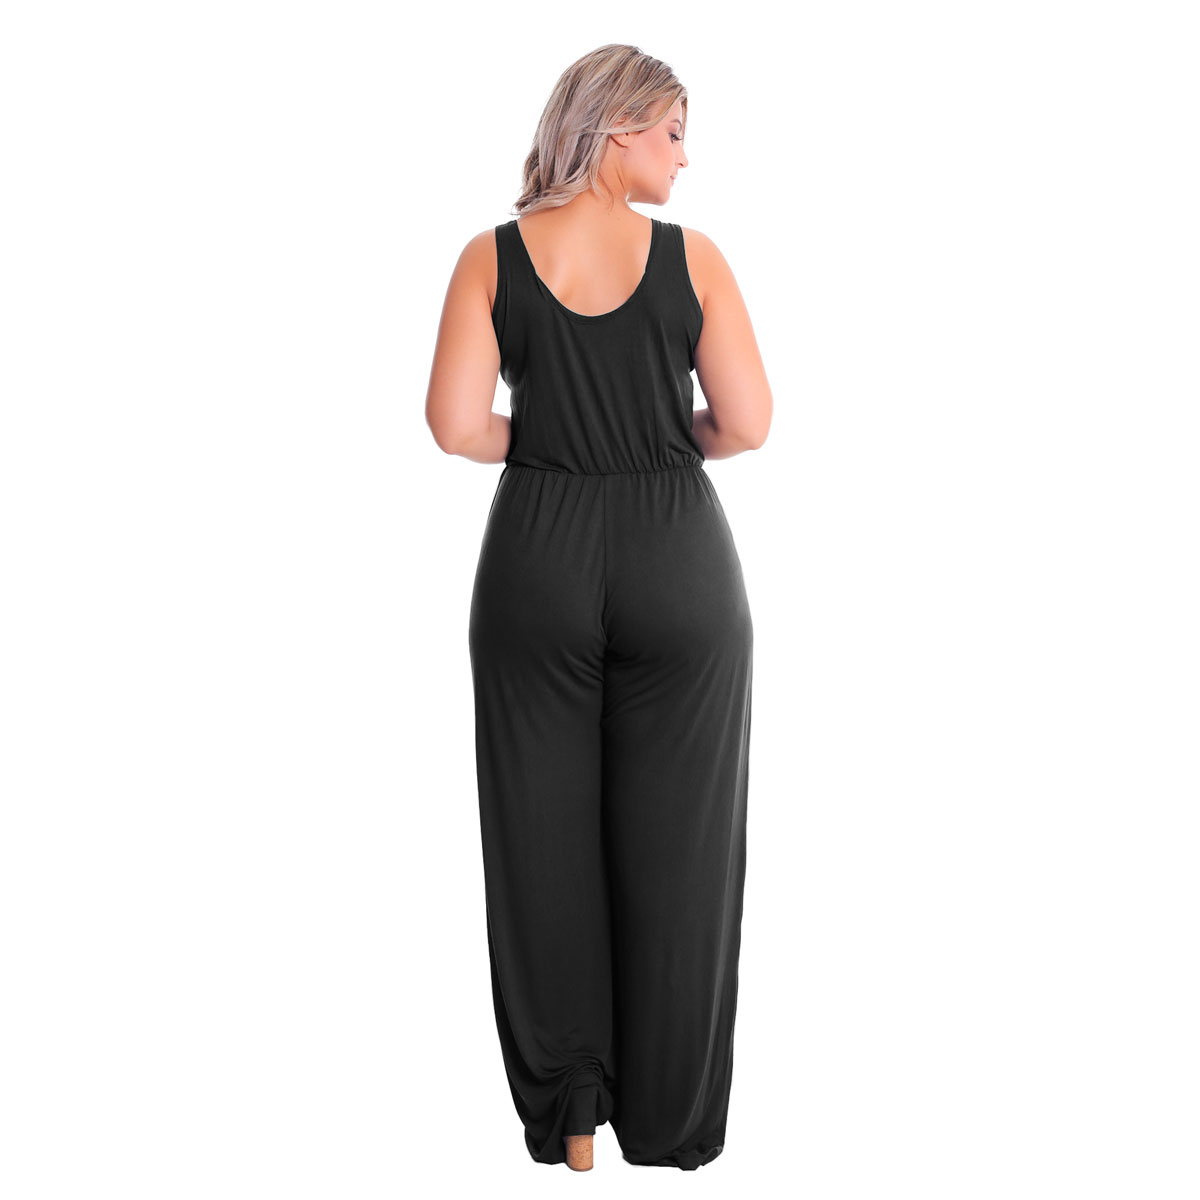 Macacão Longo Decote V Pantalona Plus Size Lynnce